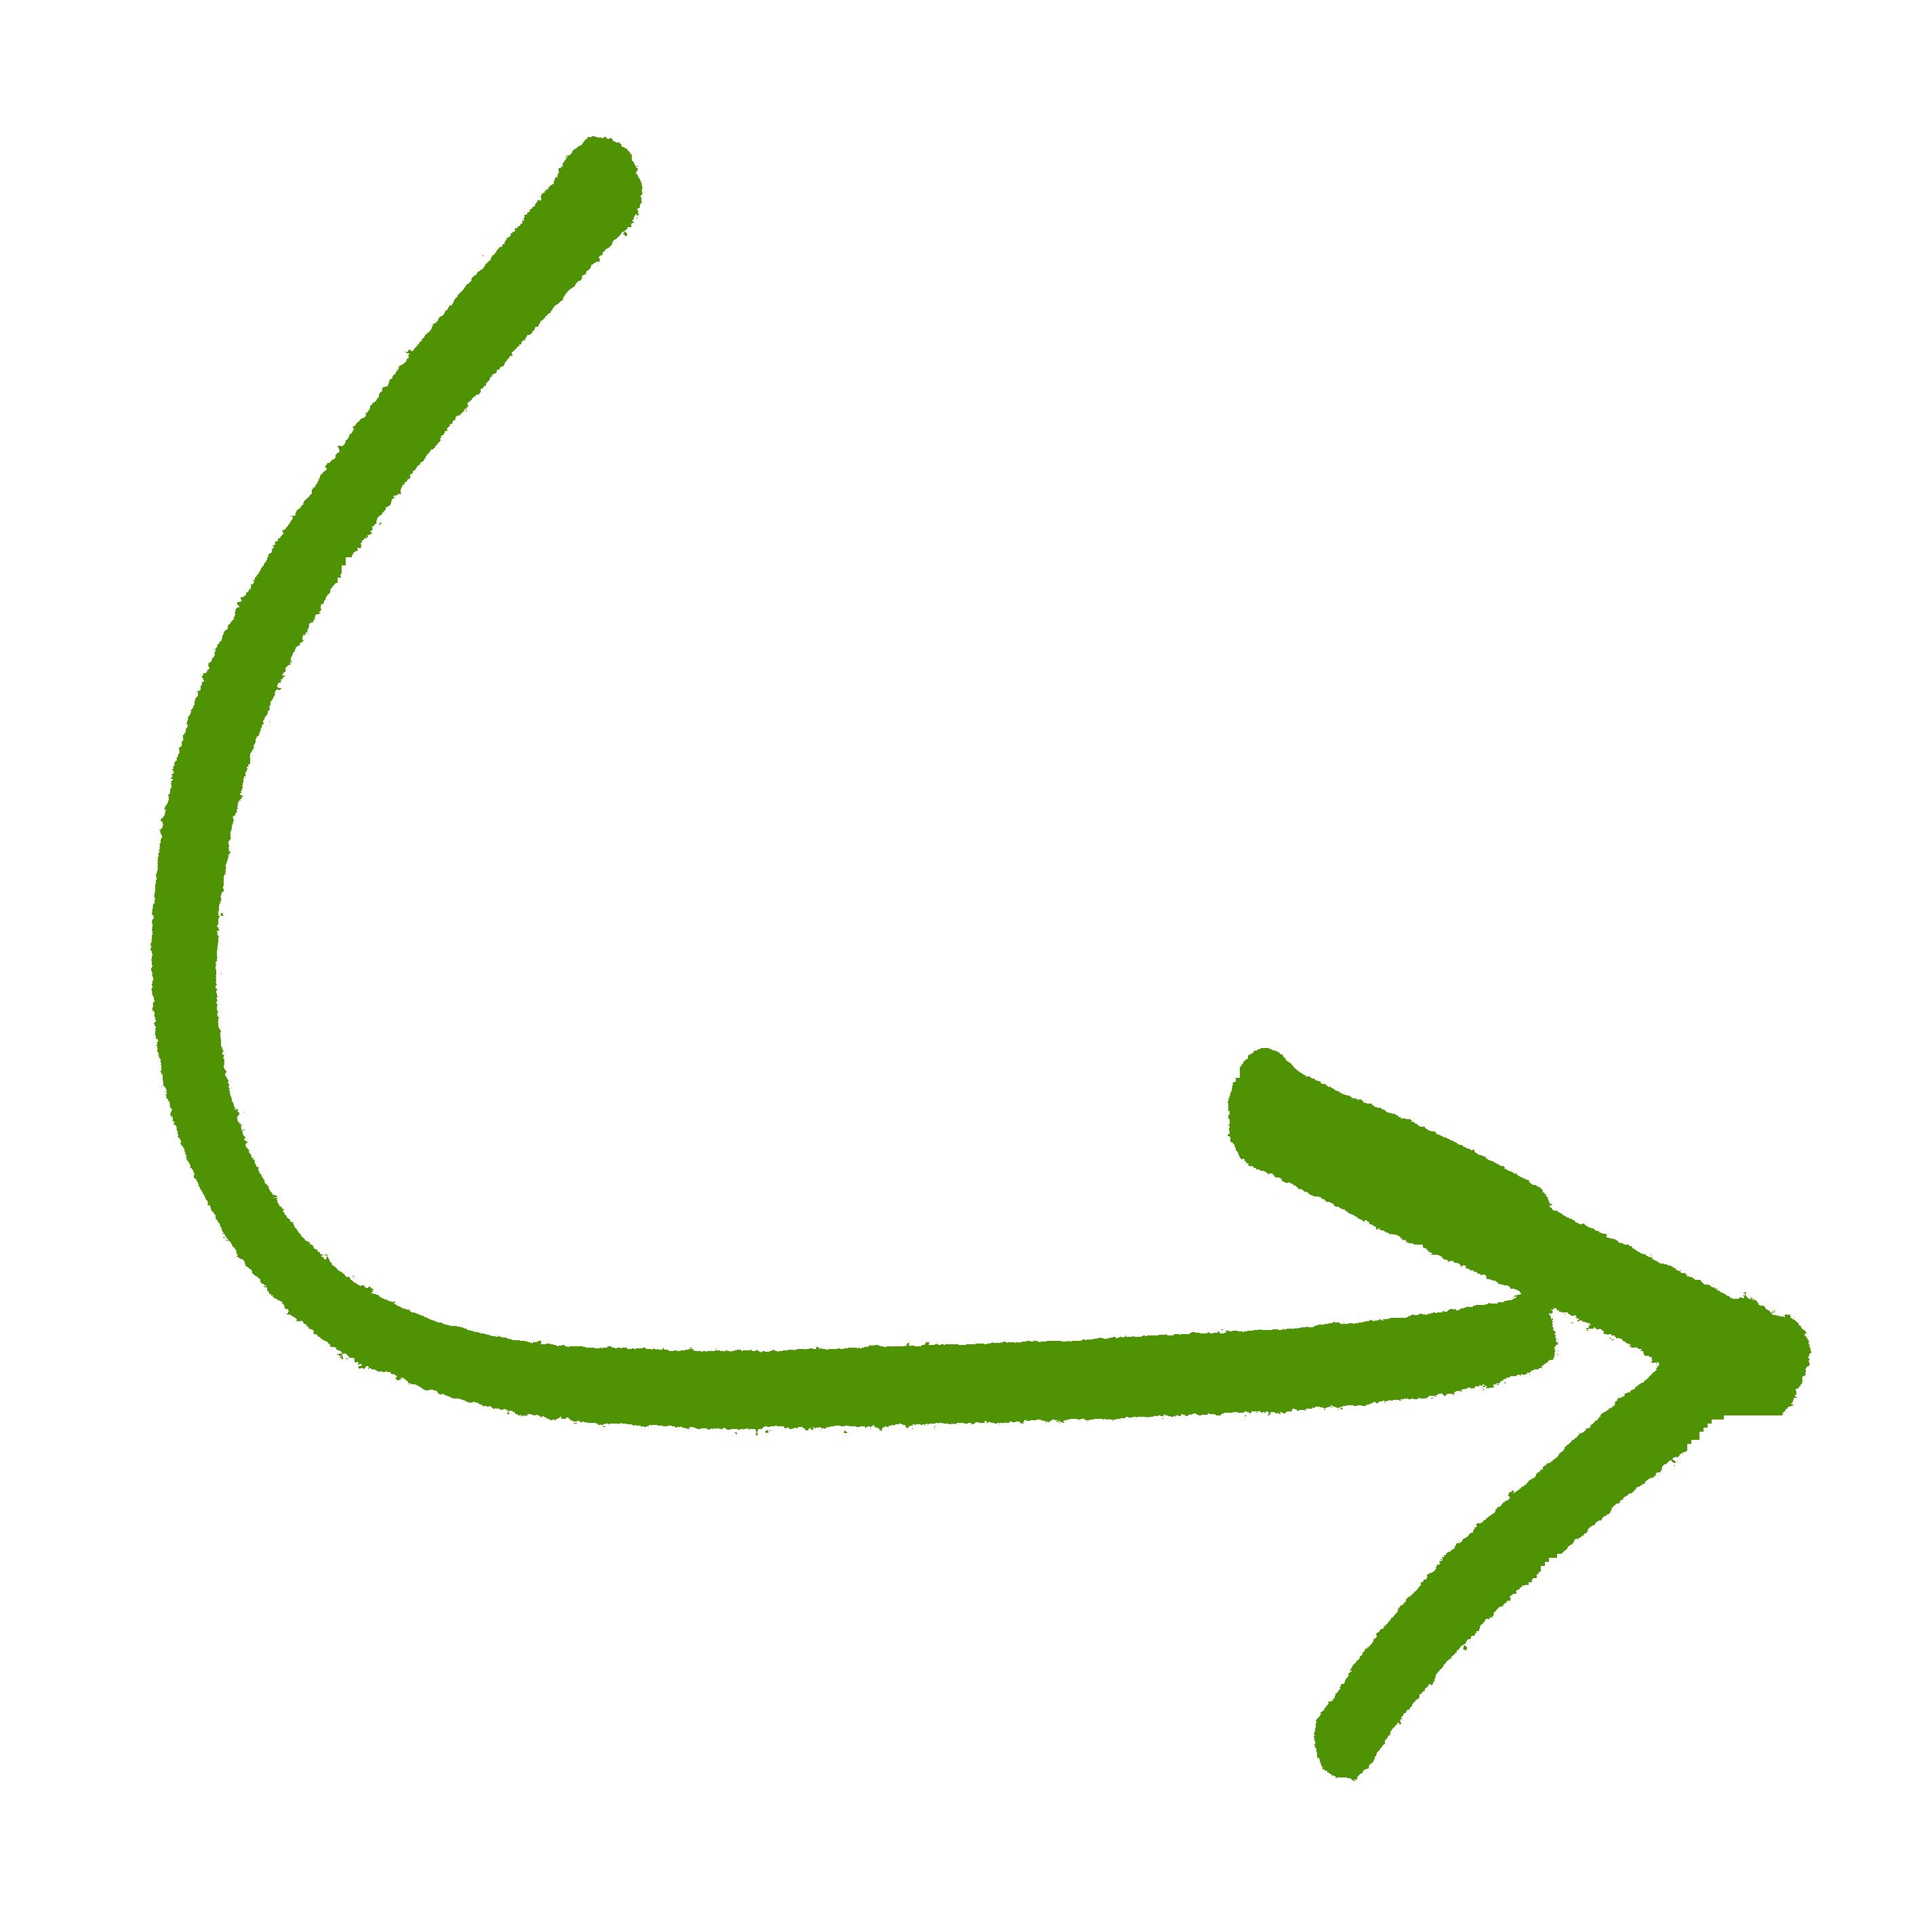 Drawn arrow green #15